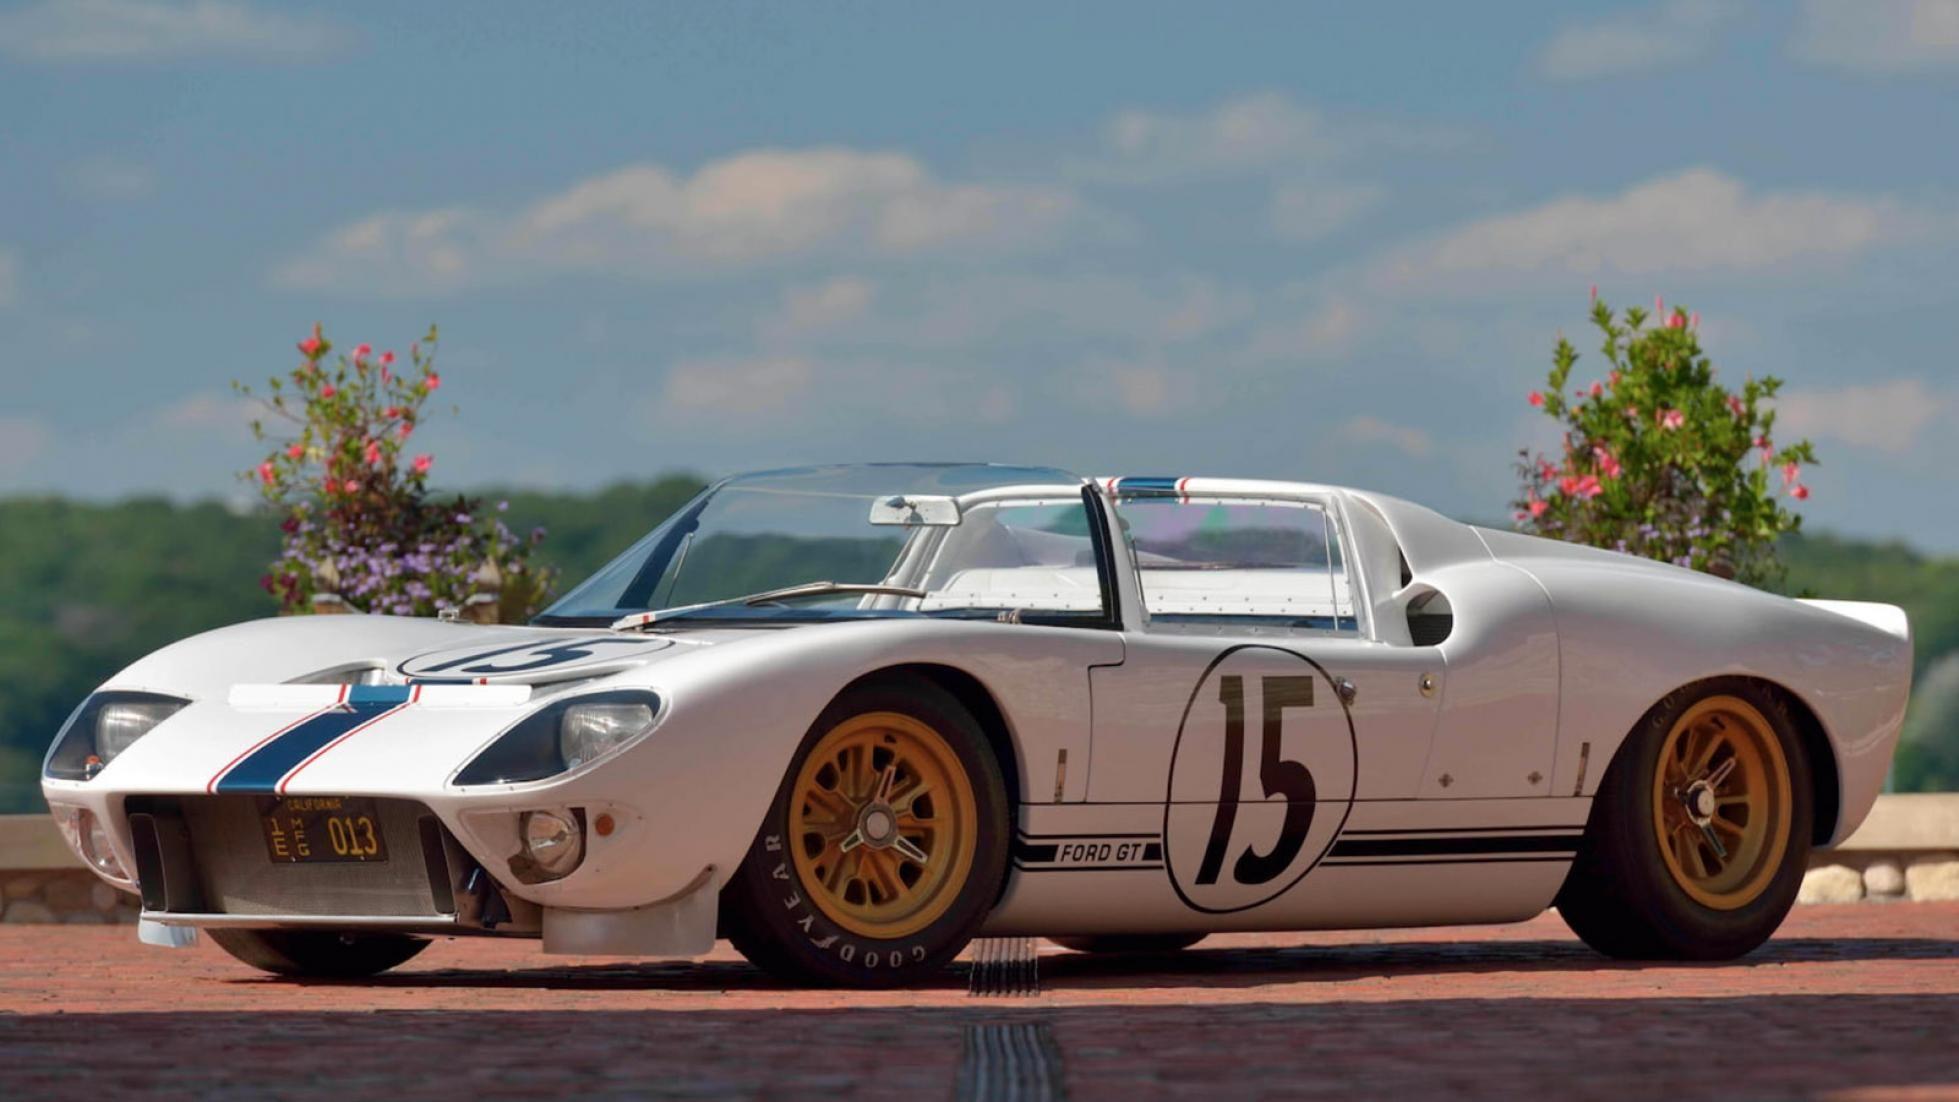 1965 Ford GT Competition Roadster satışa çıkıyor.